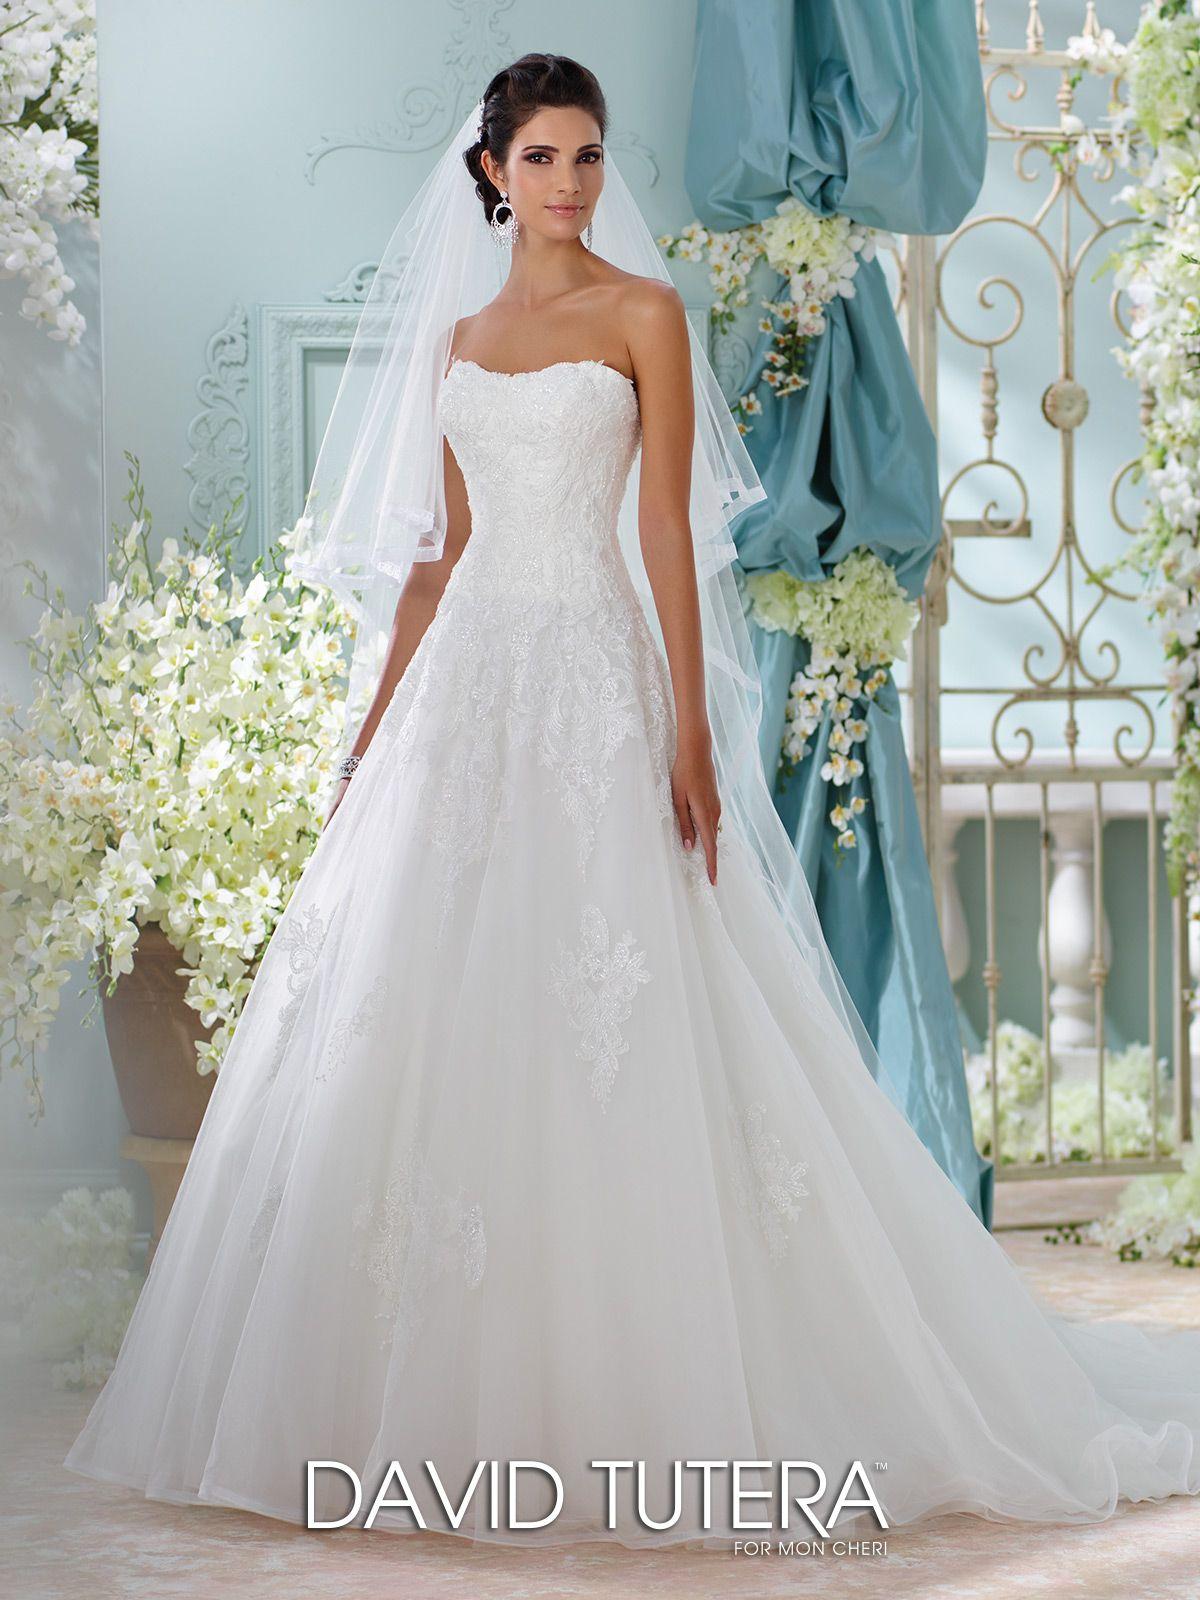 Unique Wedding Dresses Fall 2018 - Martin Thornburg   Pinterest ...